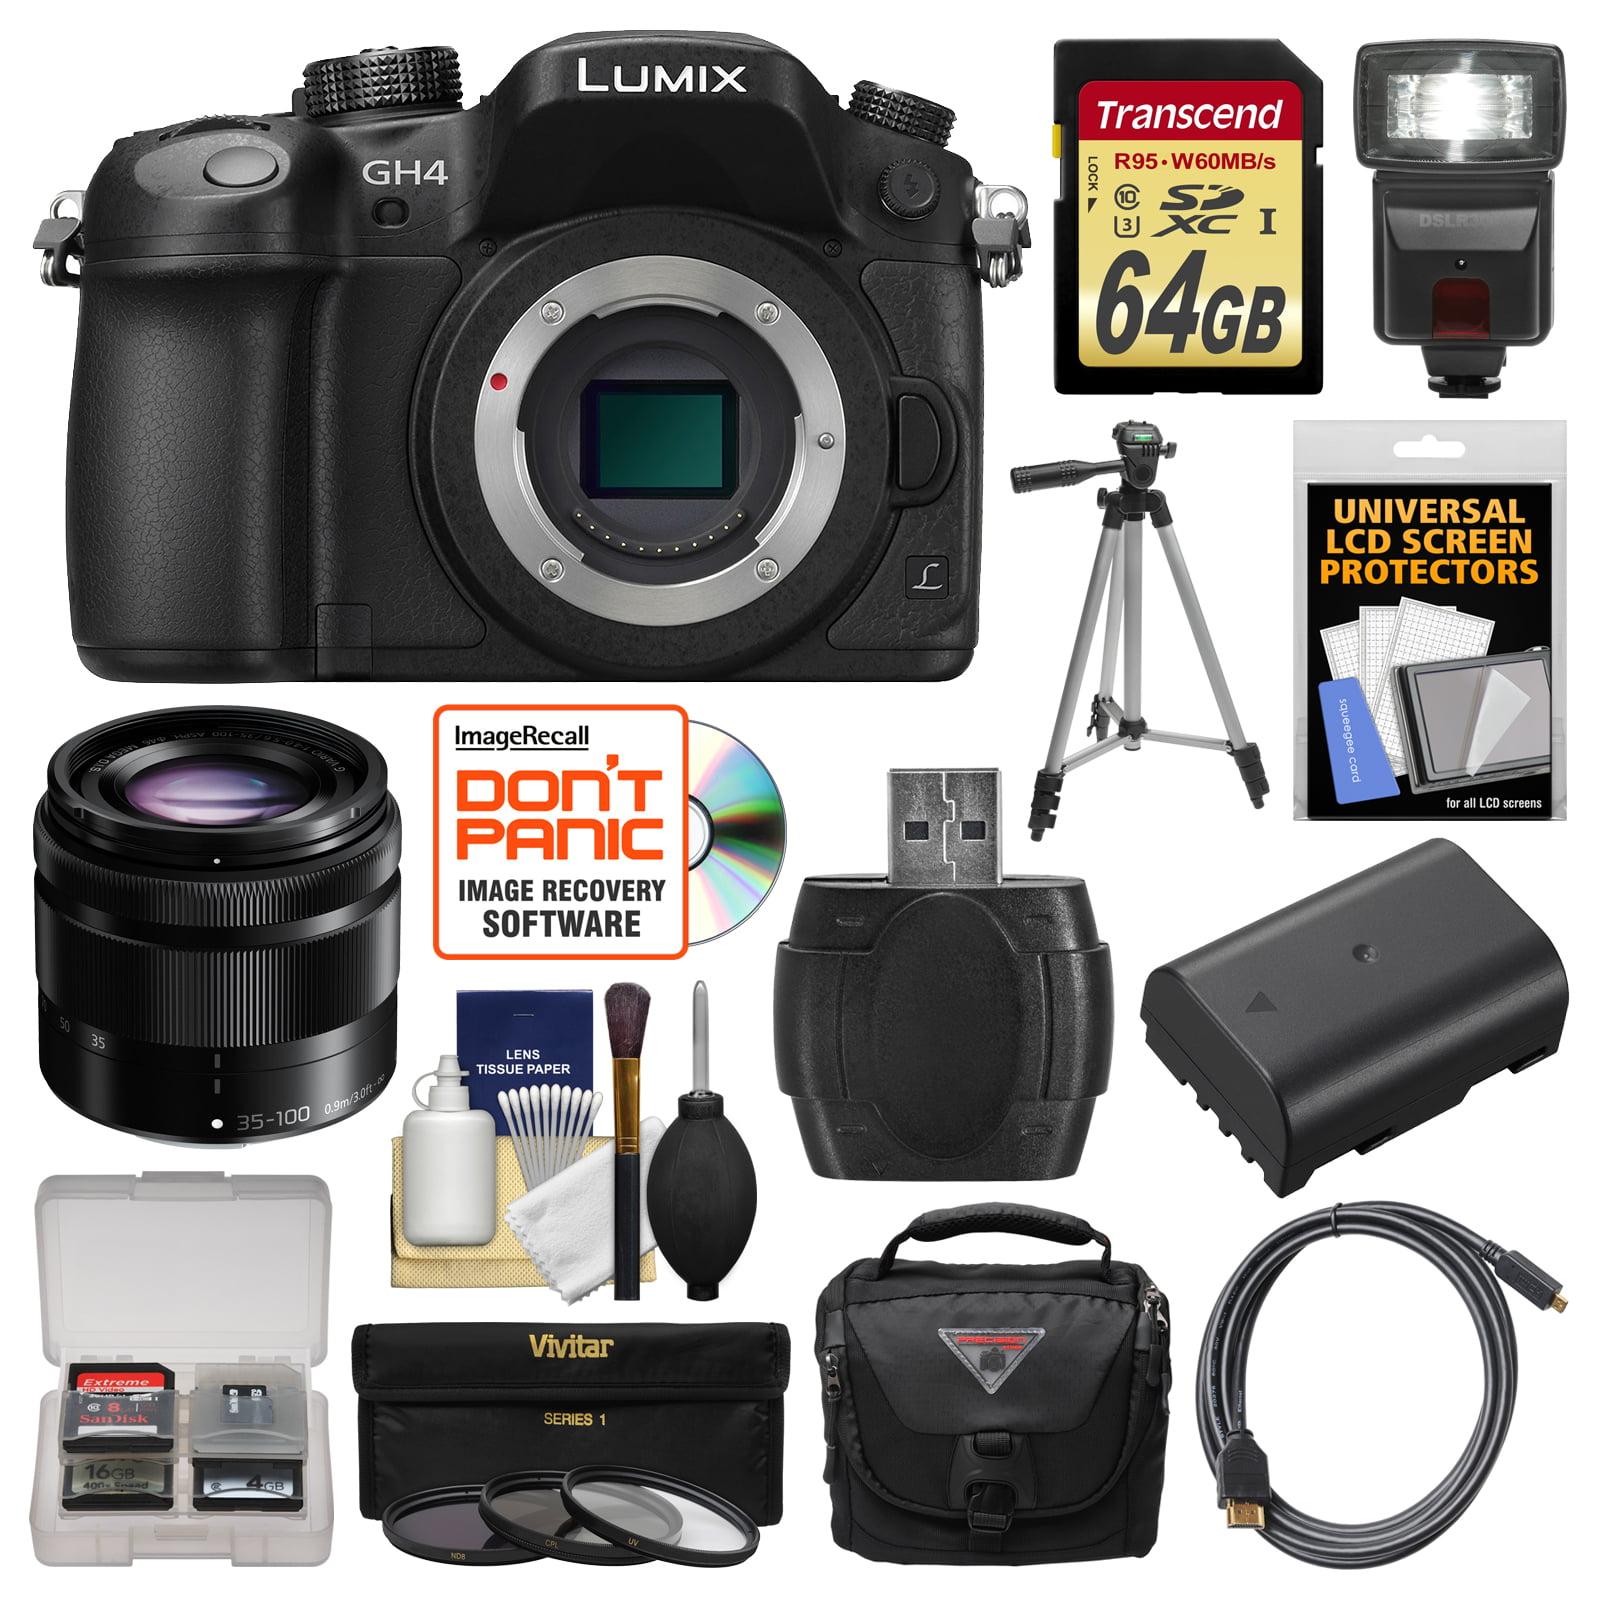 Panasonic Lumix DMC-GH4 4K Micro Four Thirds Digital Camera Body with 35-100mm Lens + 64GB Card + Case + Flash... by Panasonic